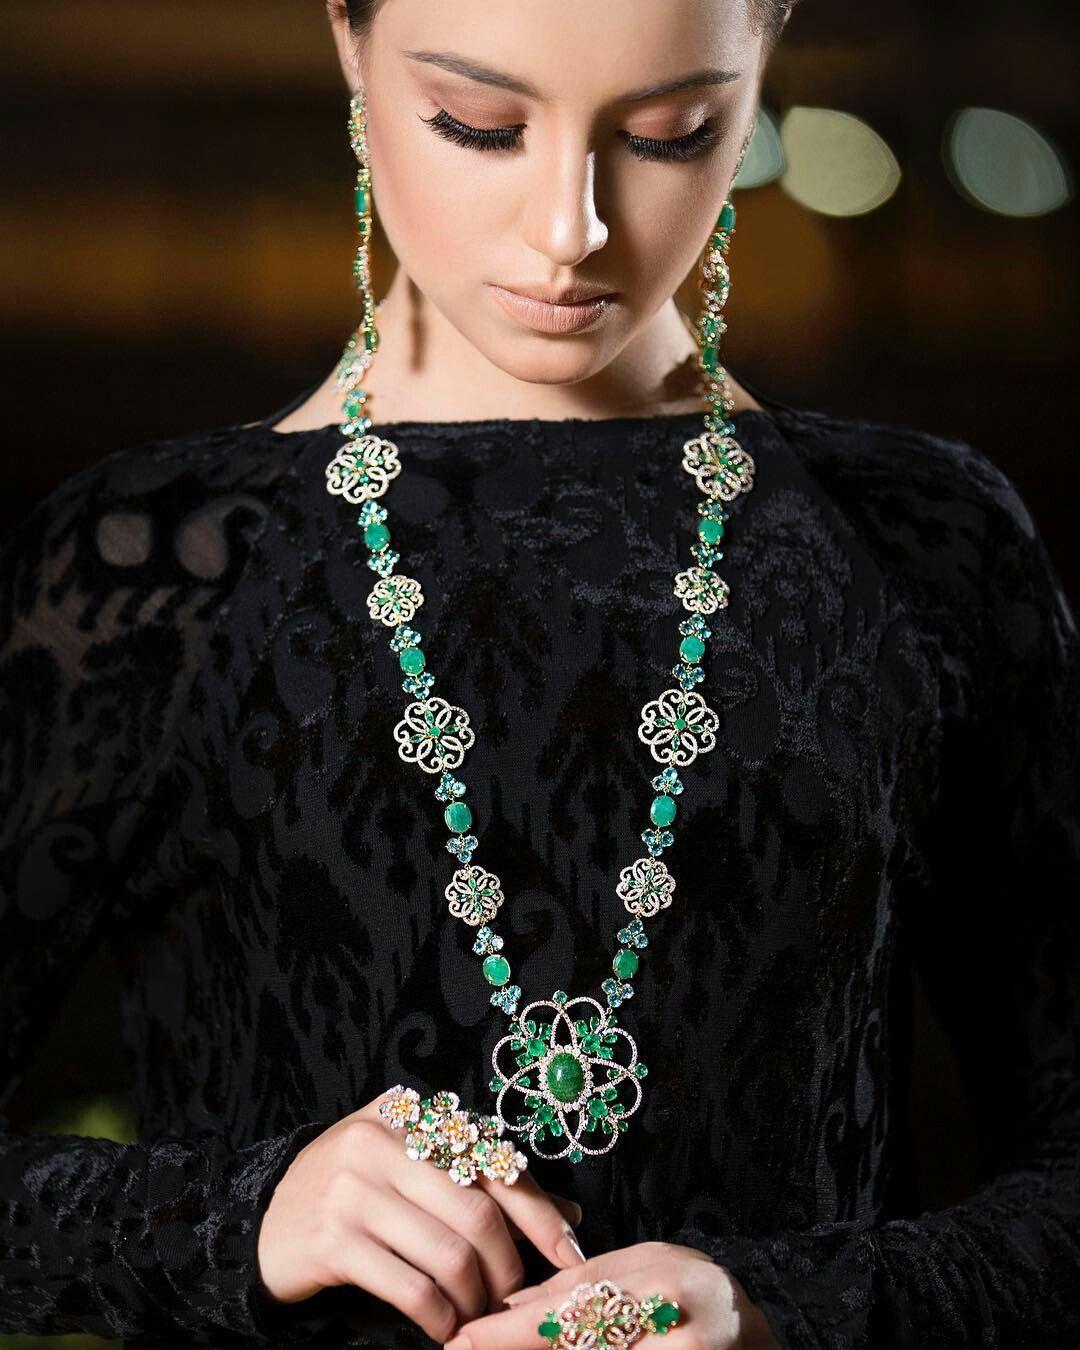 Exotic fashion jewelry -  Goldesignbrazilianjewellery This Emerald Neckalce Is Just Stunning Lotus Jewelryjewelry Boxjeweleryslytherindiamond Necklacesexoticfashion